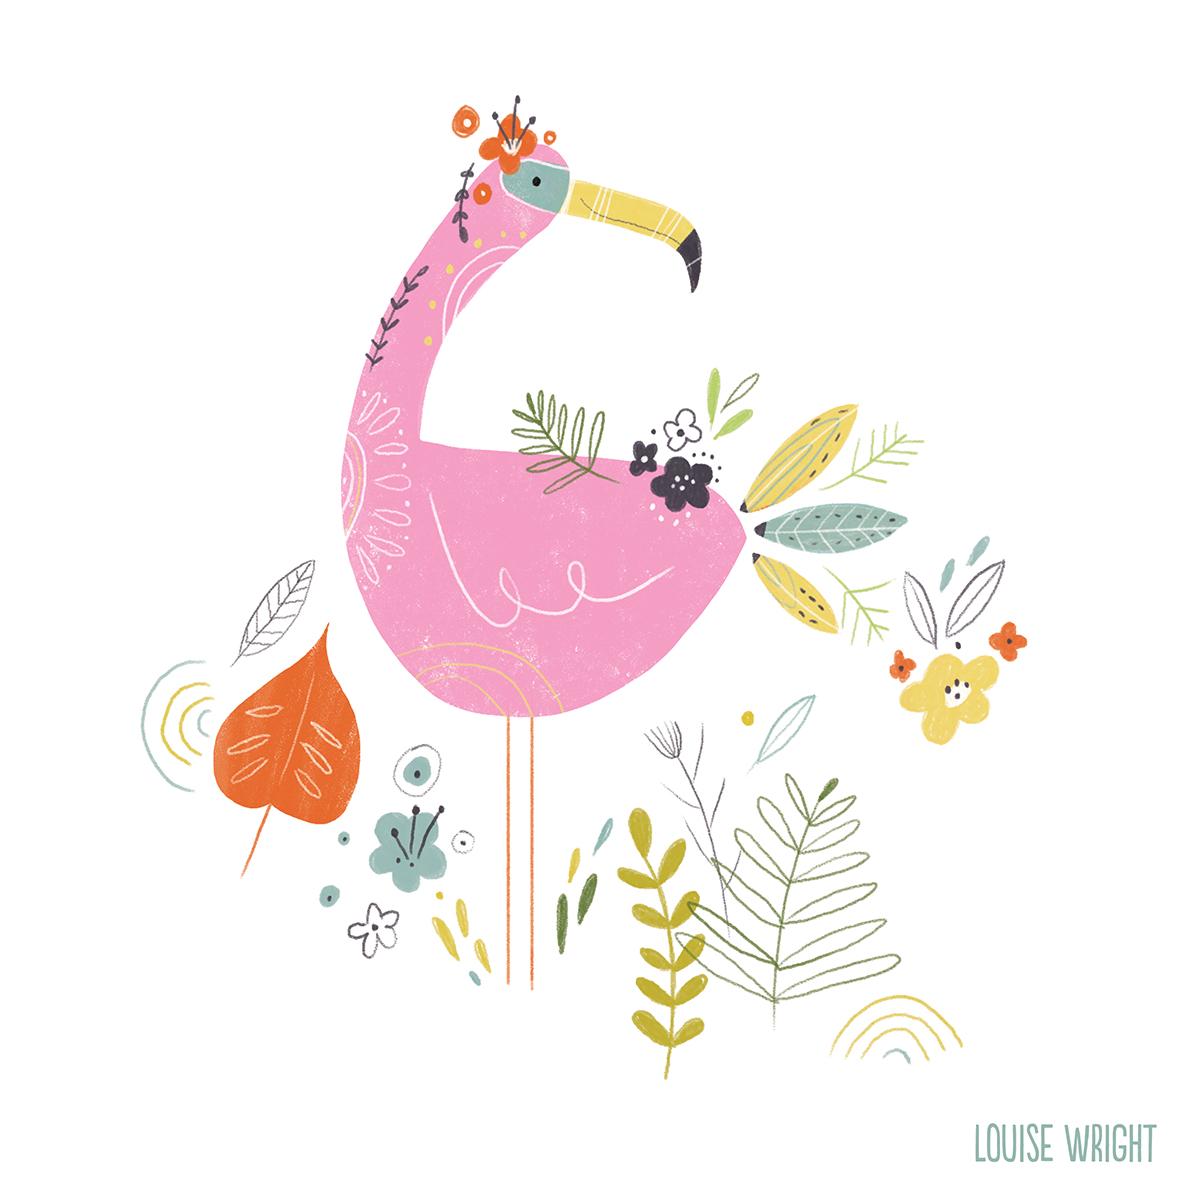 flamingo louise wright.jpg